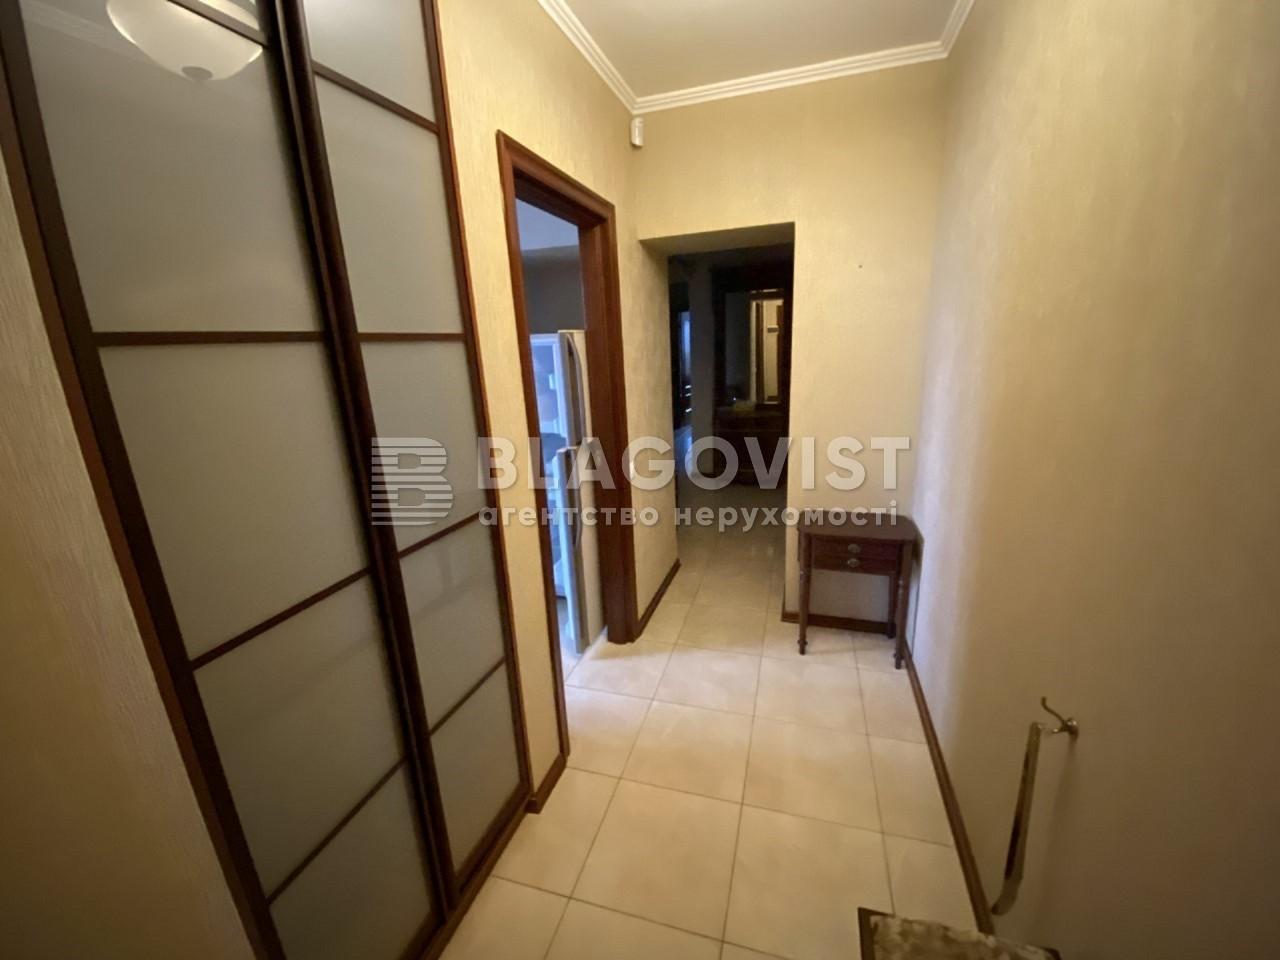 Квартира R-30797, Леси Украинки бульв., 9в, Киев - Фото 8